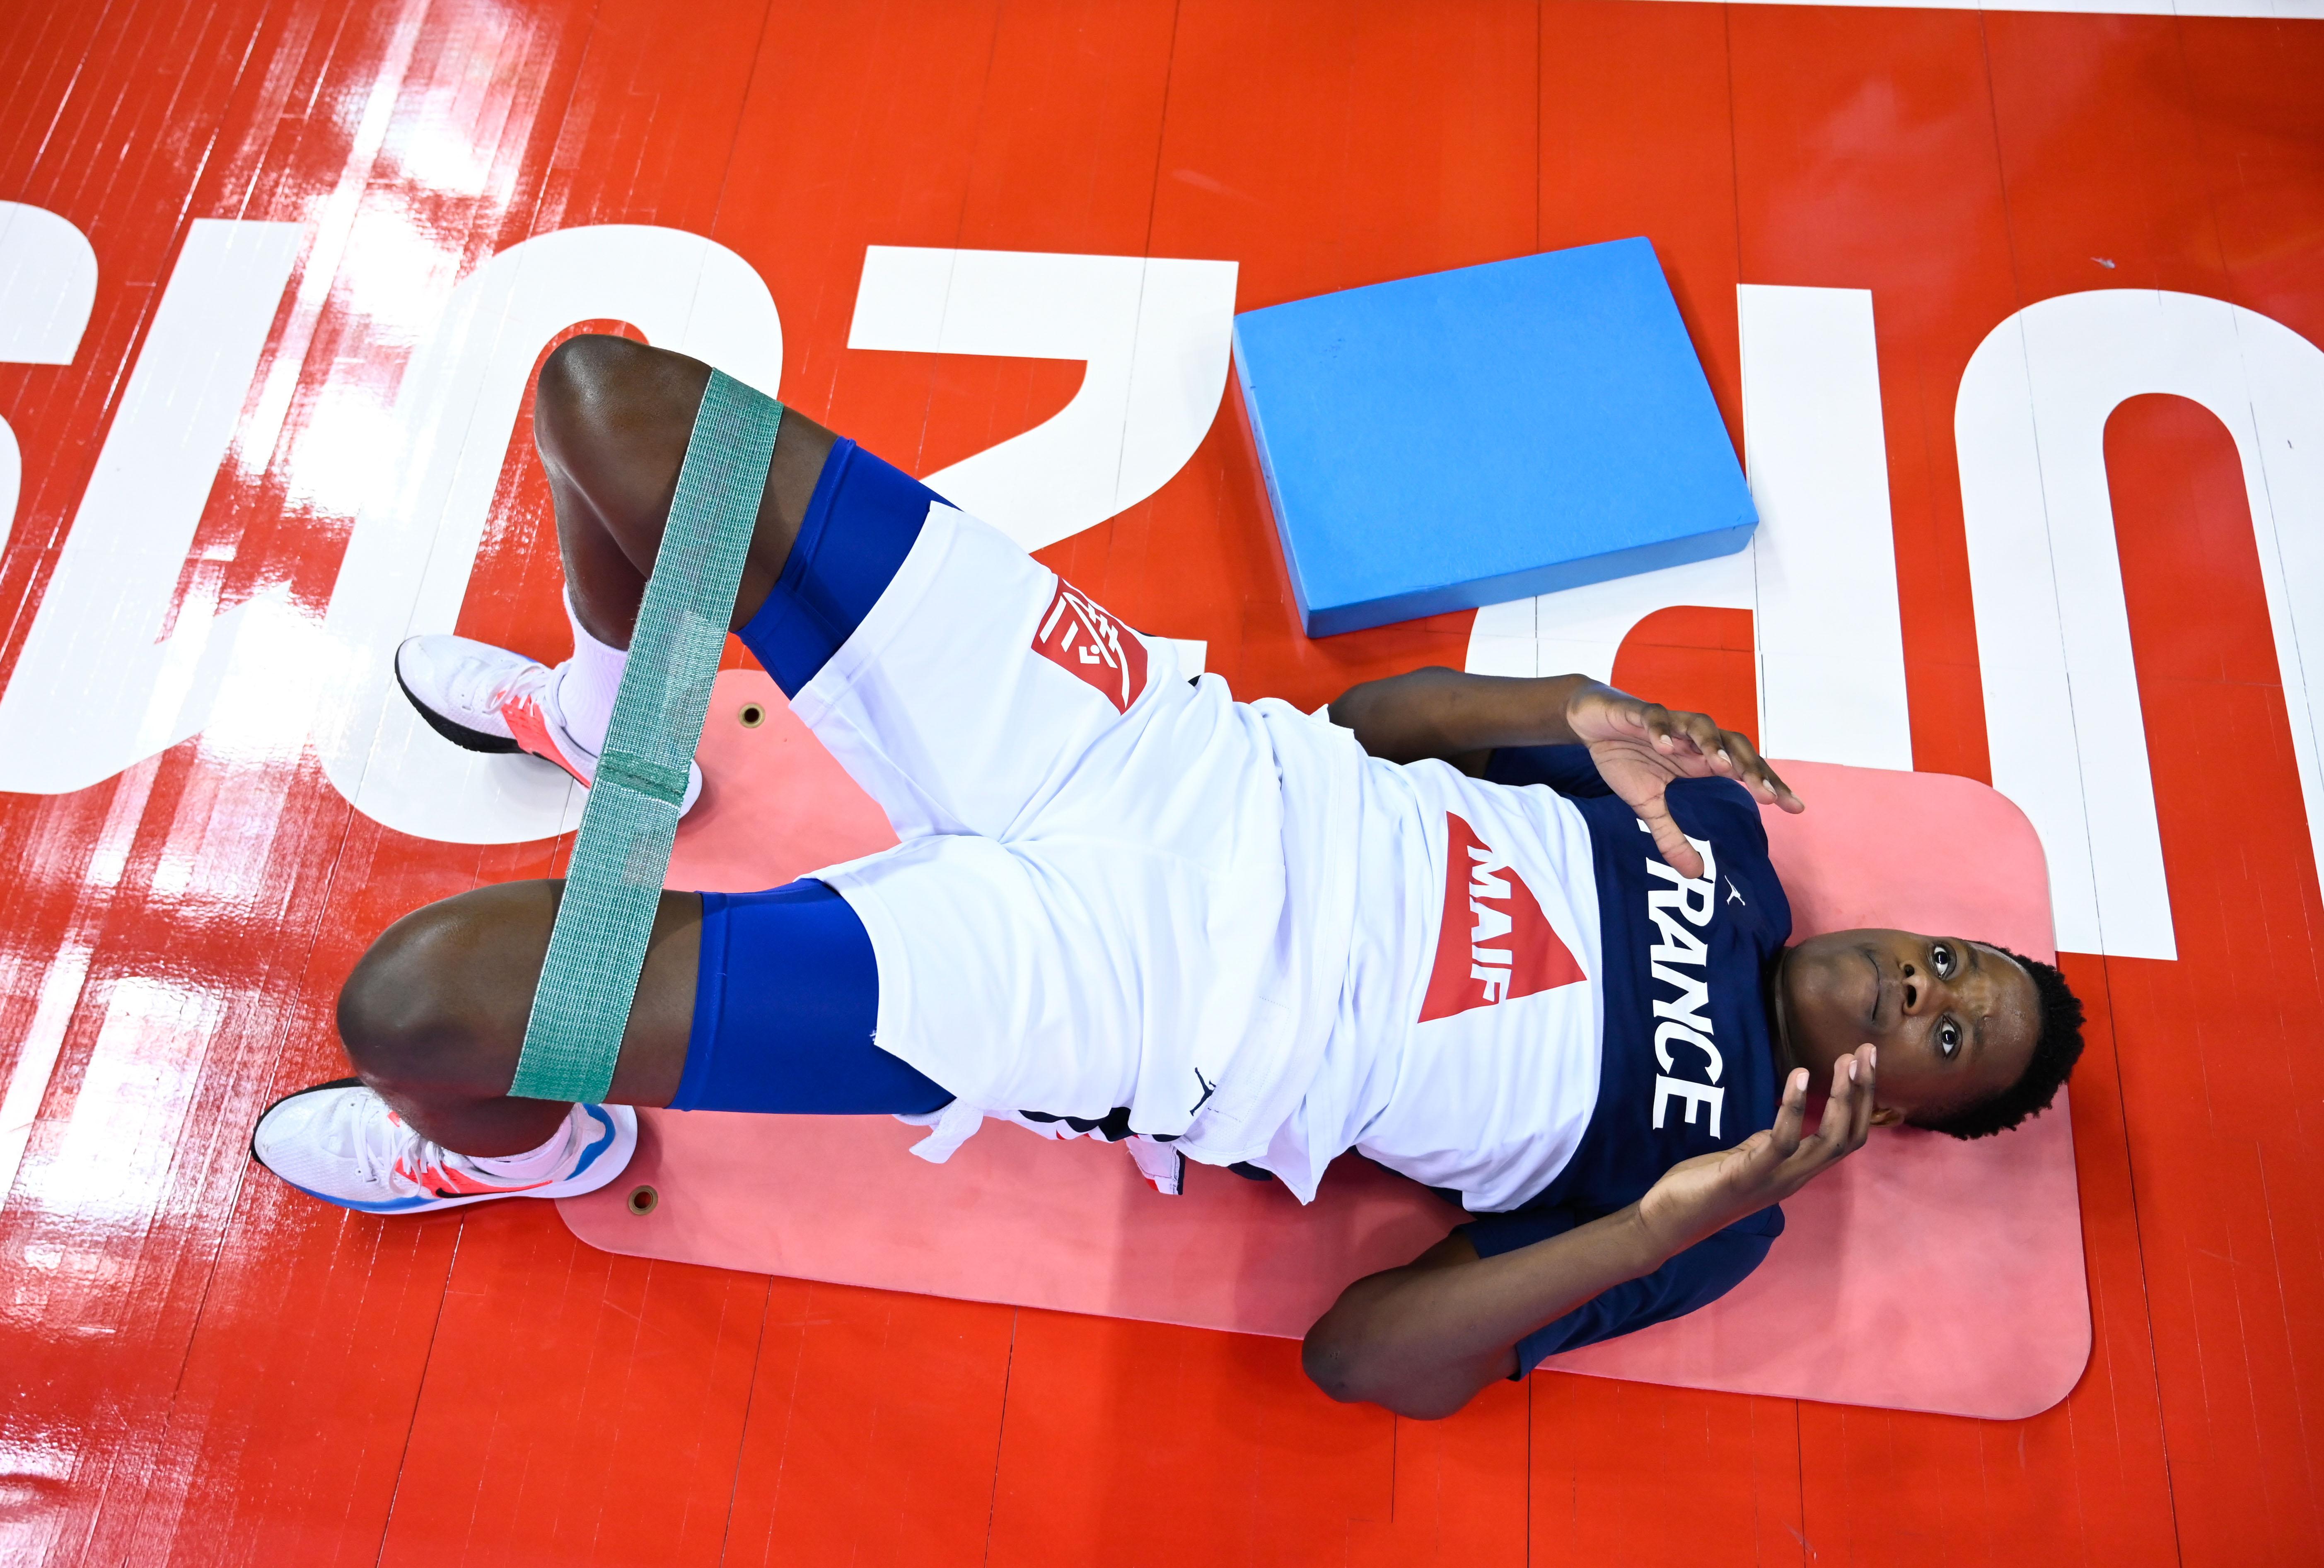 France v Lithuania - FIBA Basketball World Cup 2019